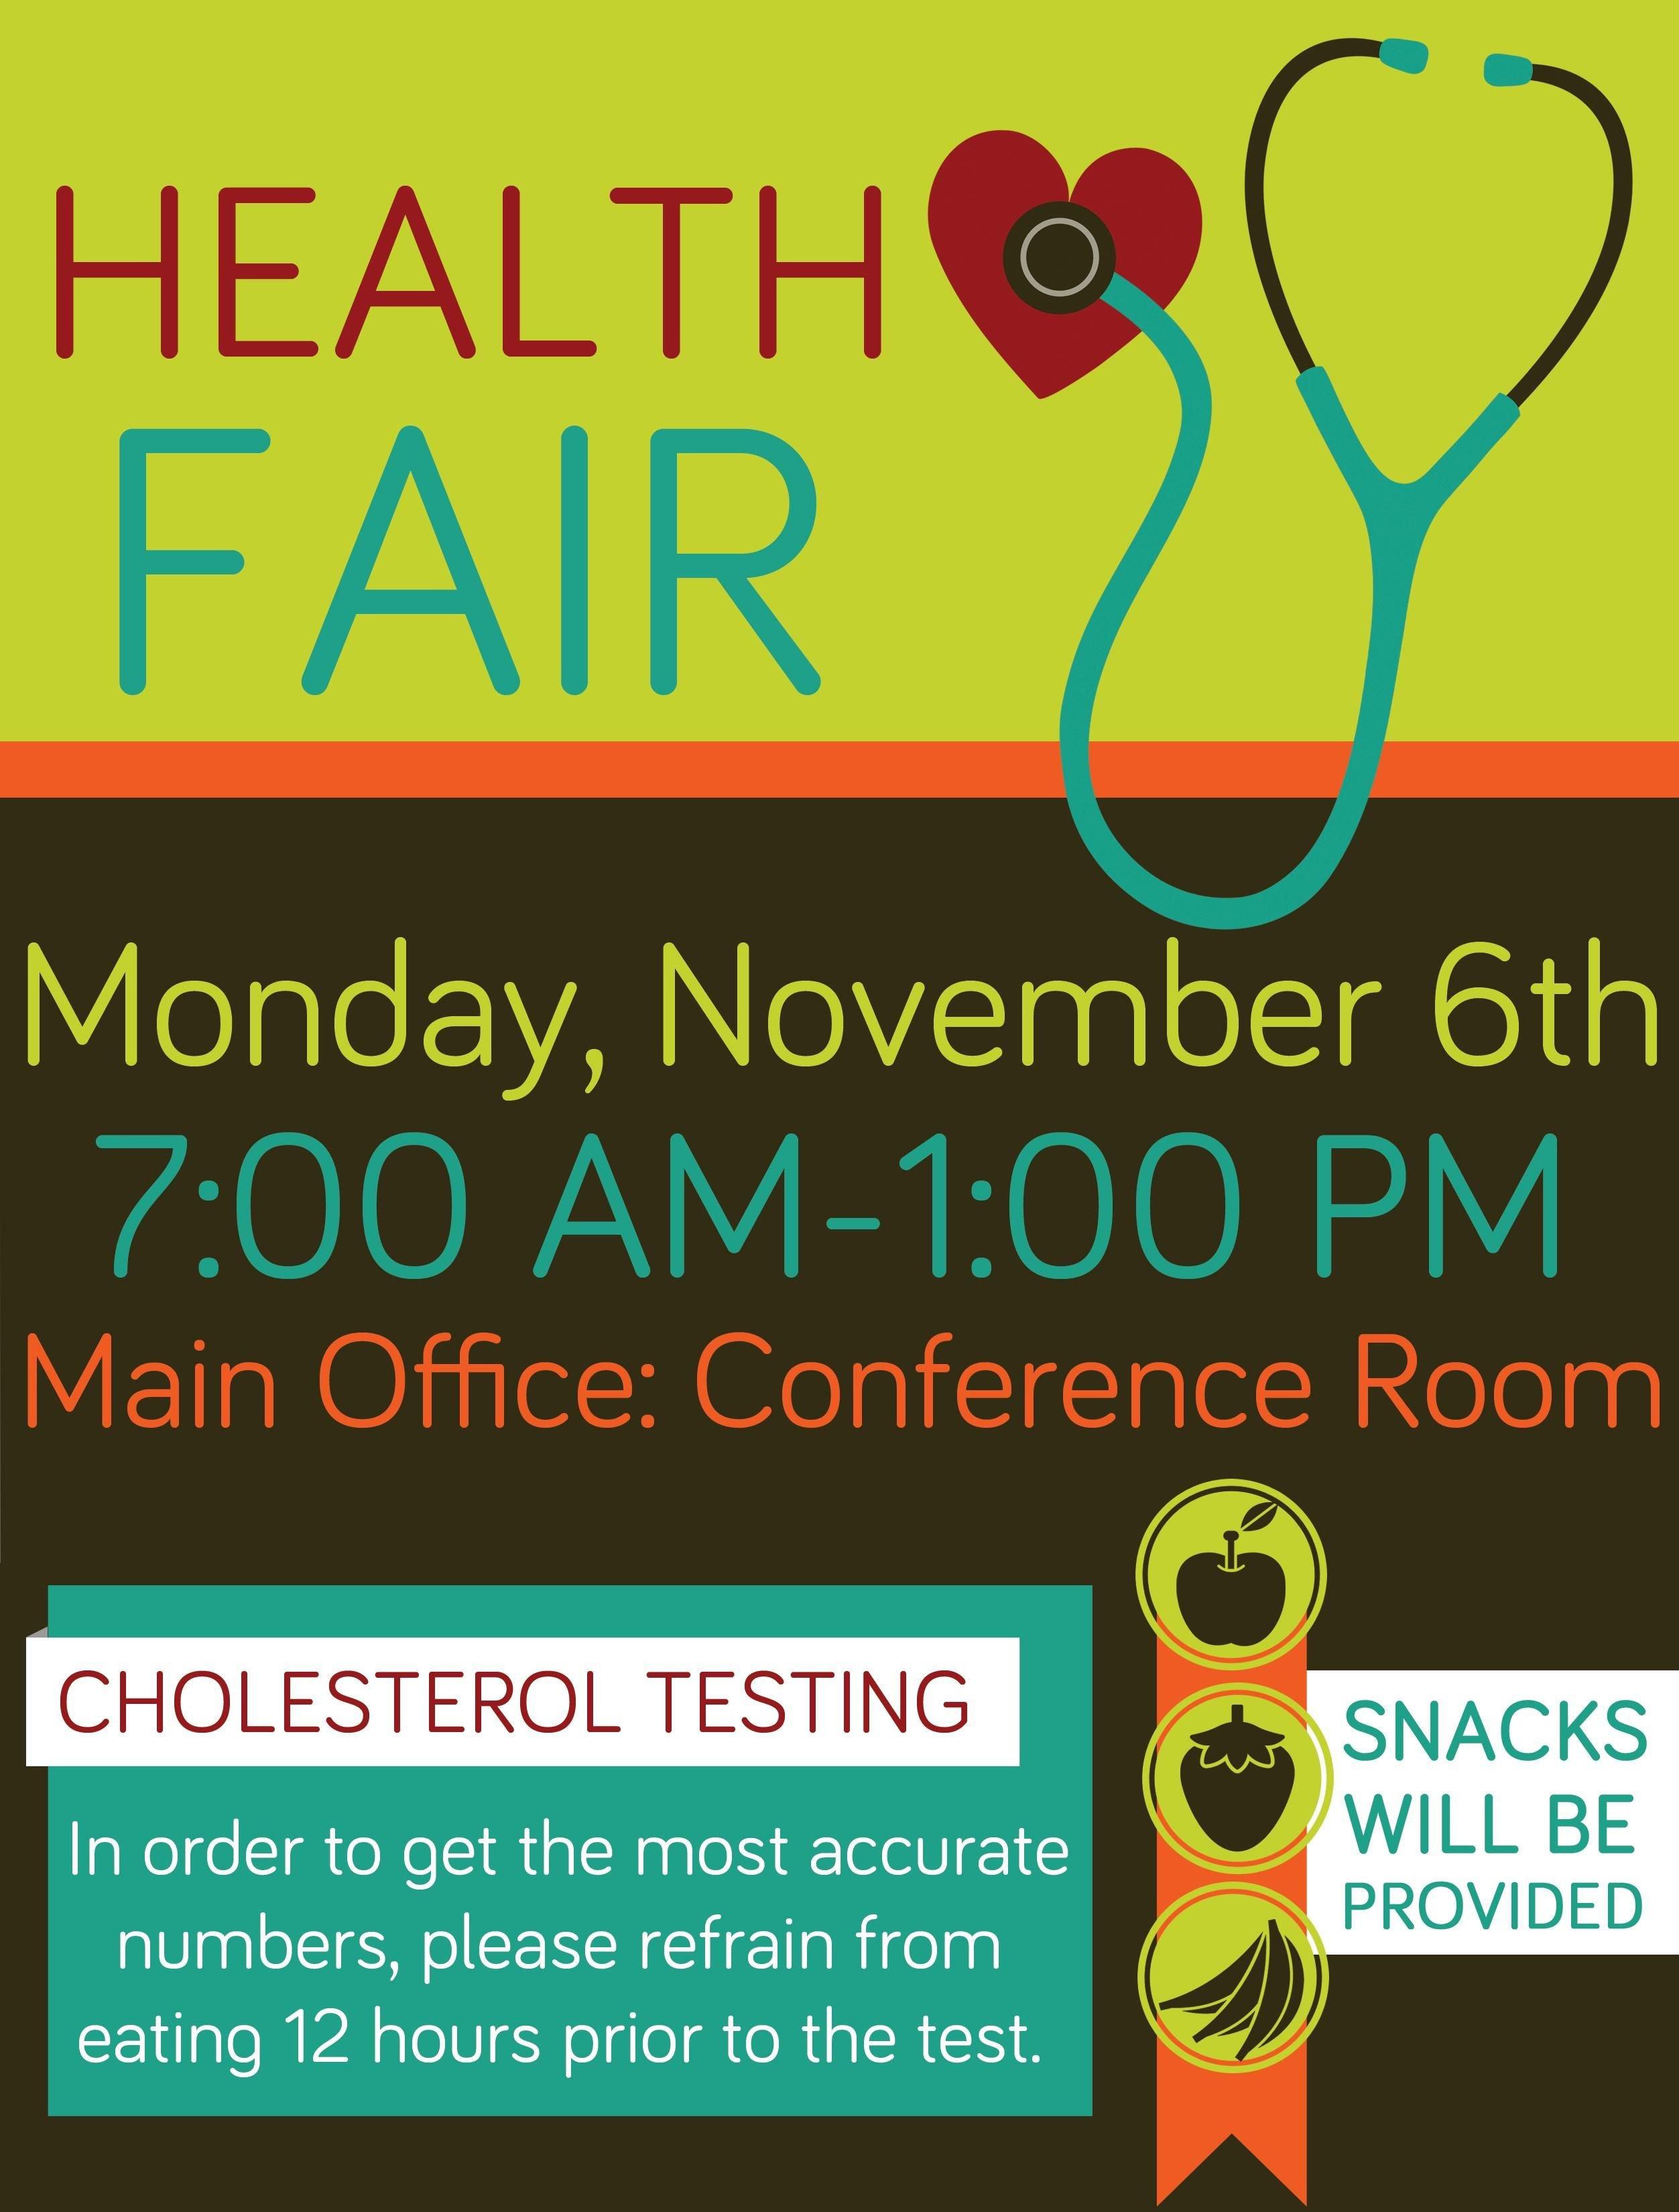 Health Fair Flyer Template Free Pany Health Fair Flyer Graphic Design School Health